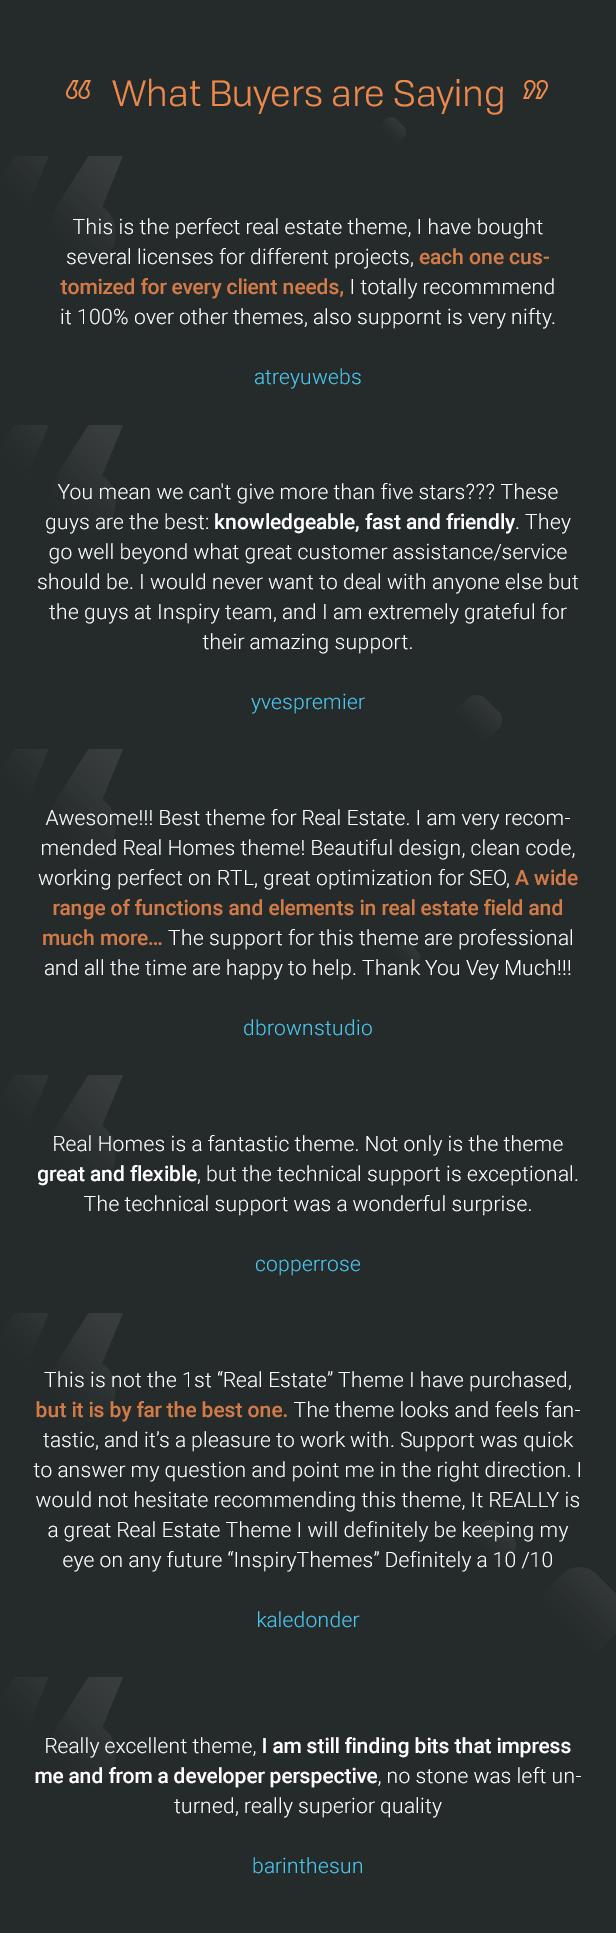 RealHomes - Estate Sale and Rental WordPress Theme, free download RealHomes - Estate Sale and Rental WordPress Theme, nulled RealHomes - Estate Sale and Rental WordPress Theme, review RealHomes - Estate Sale and Rental WordPress Theme, coupon RealHomes - Estate Sale and Rental WordPress Theme,